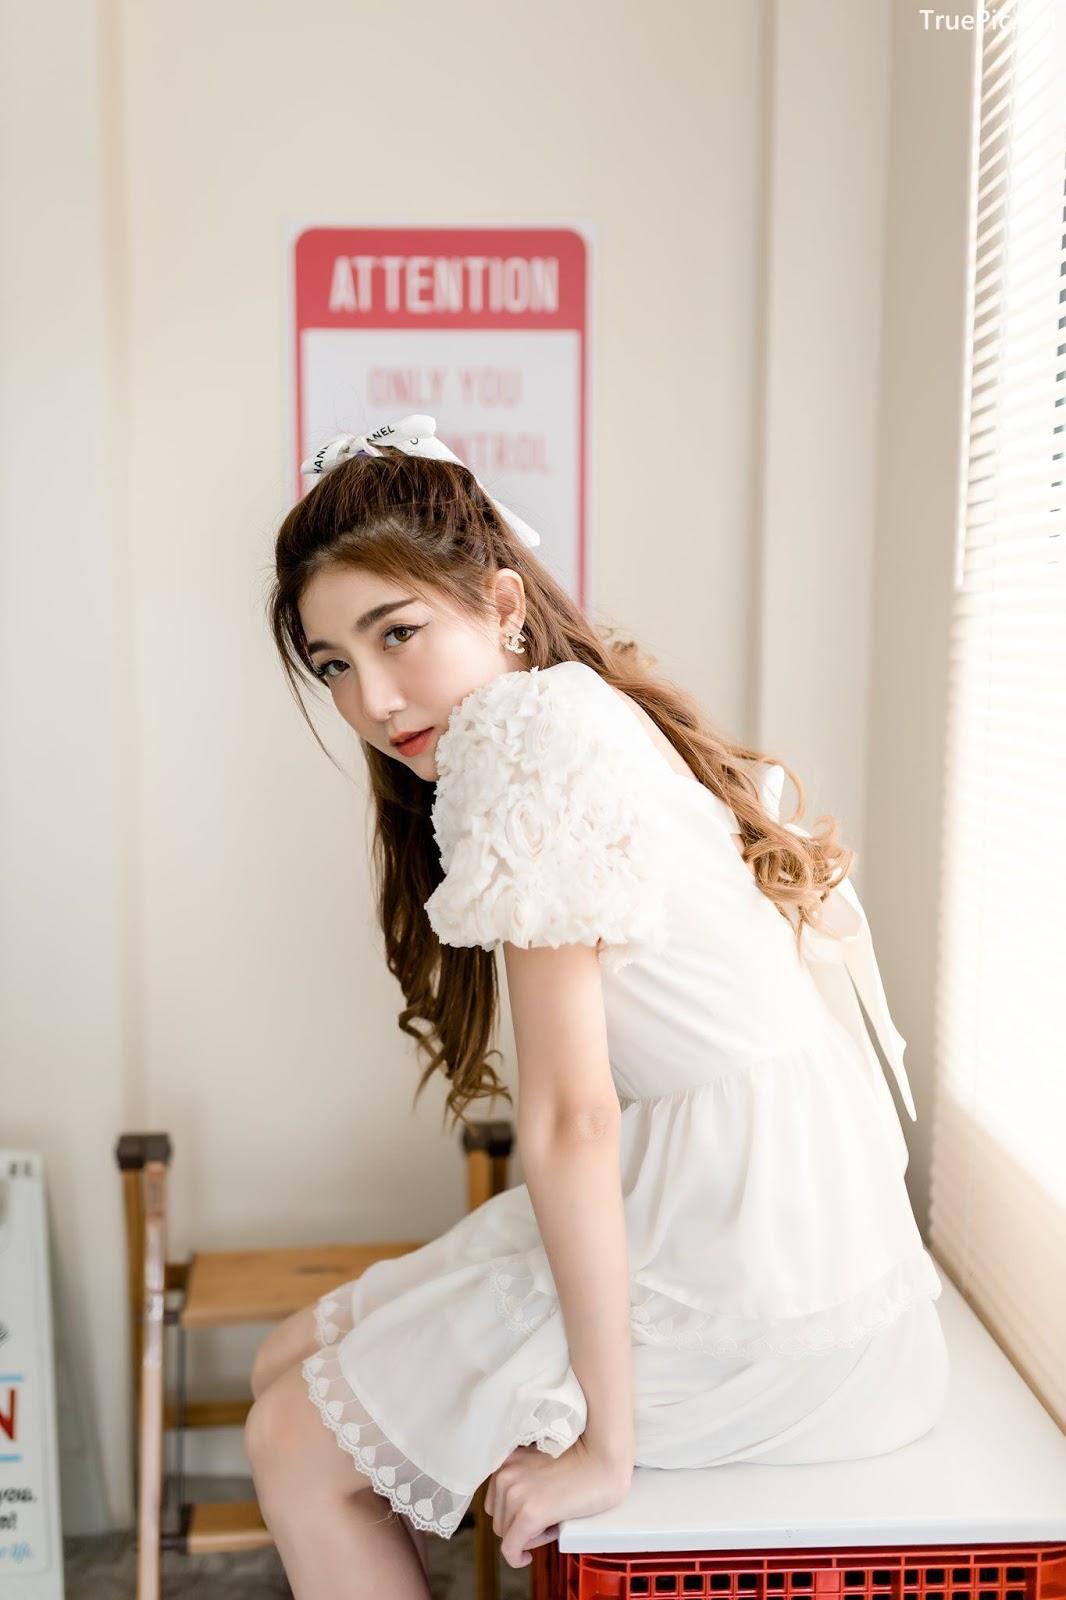 Image Thailand Model - Sasi Ngiunwan - Barbie Doll Smile - TruePic.net - Picture-1